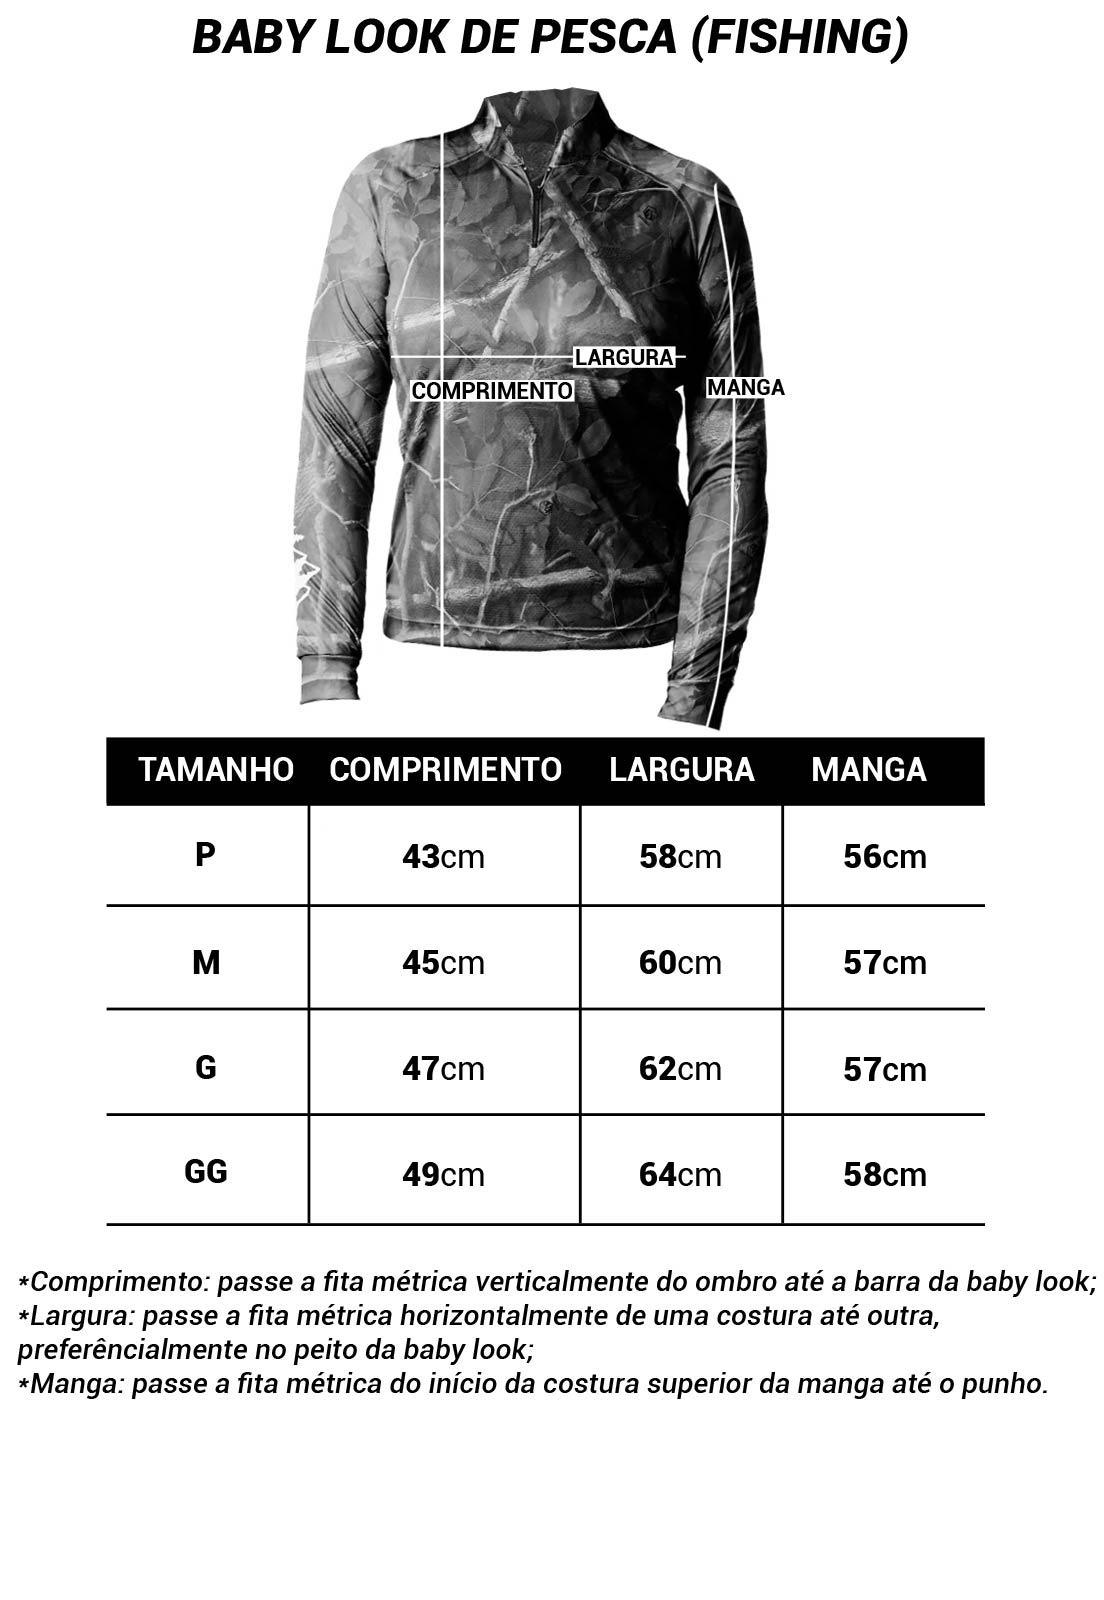 CAMISA DE PESCA FISH TECH PRO 09 FEMININA + BANDANA GRÁTIS  - REAL HUNTER OUTDOORS